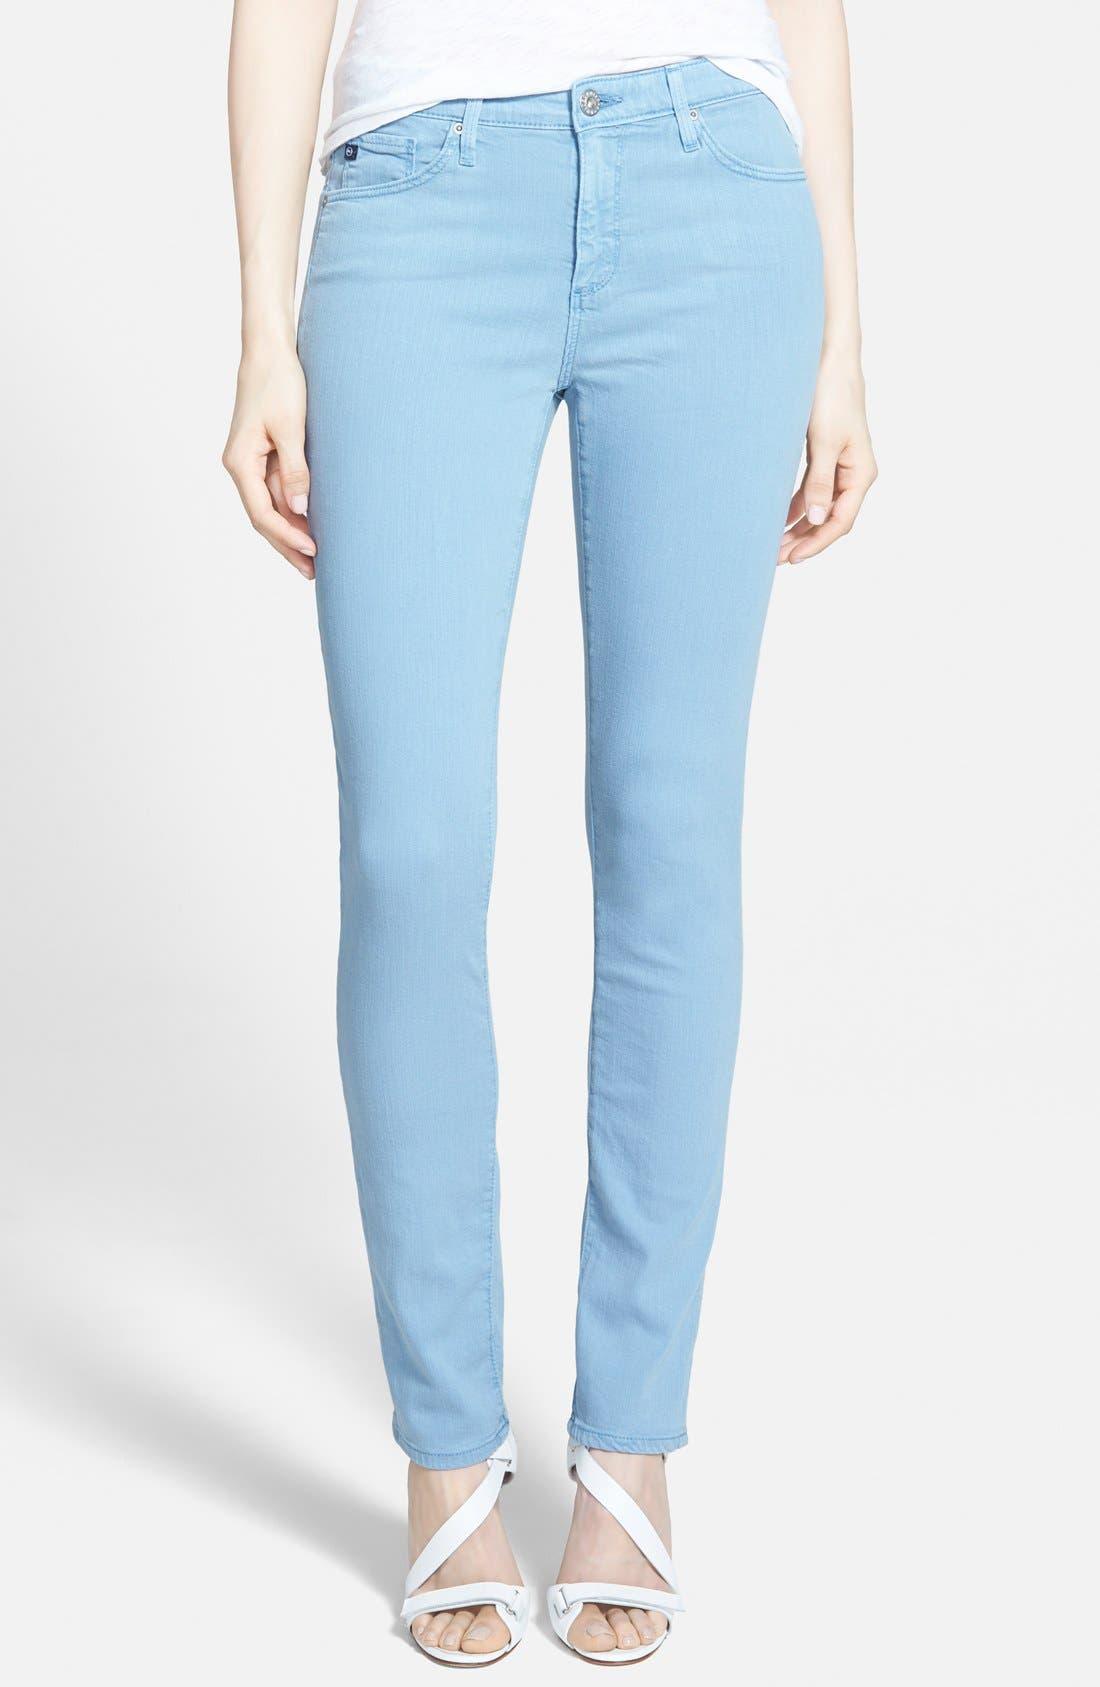 Main Image - AG 'The Prima' Cigarette Leg Skinny Jeans (Sulfur Hazy)